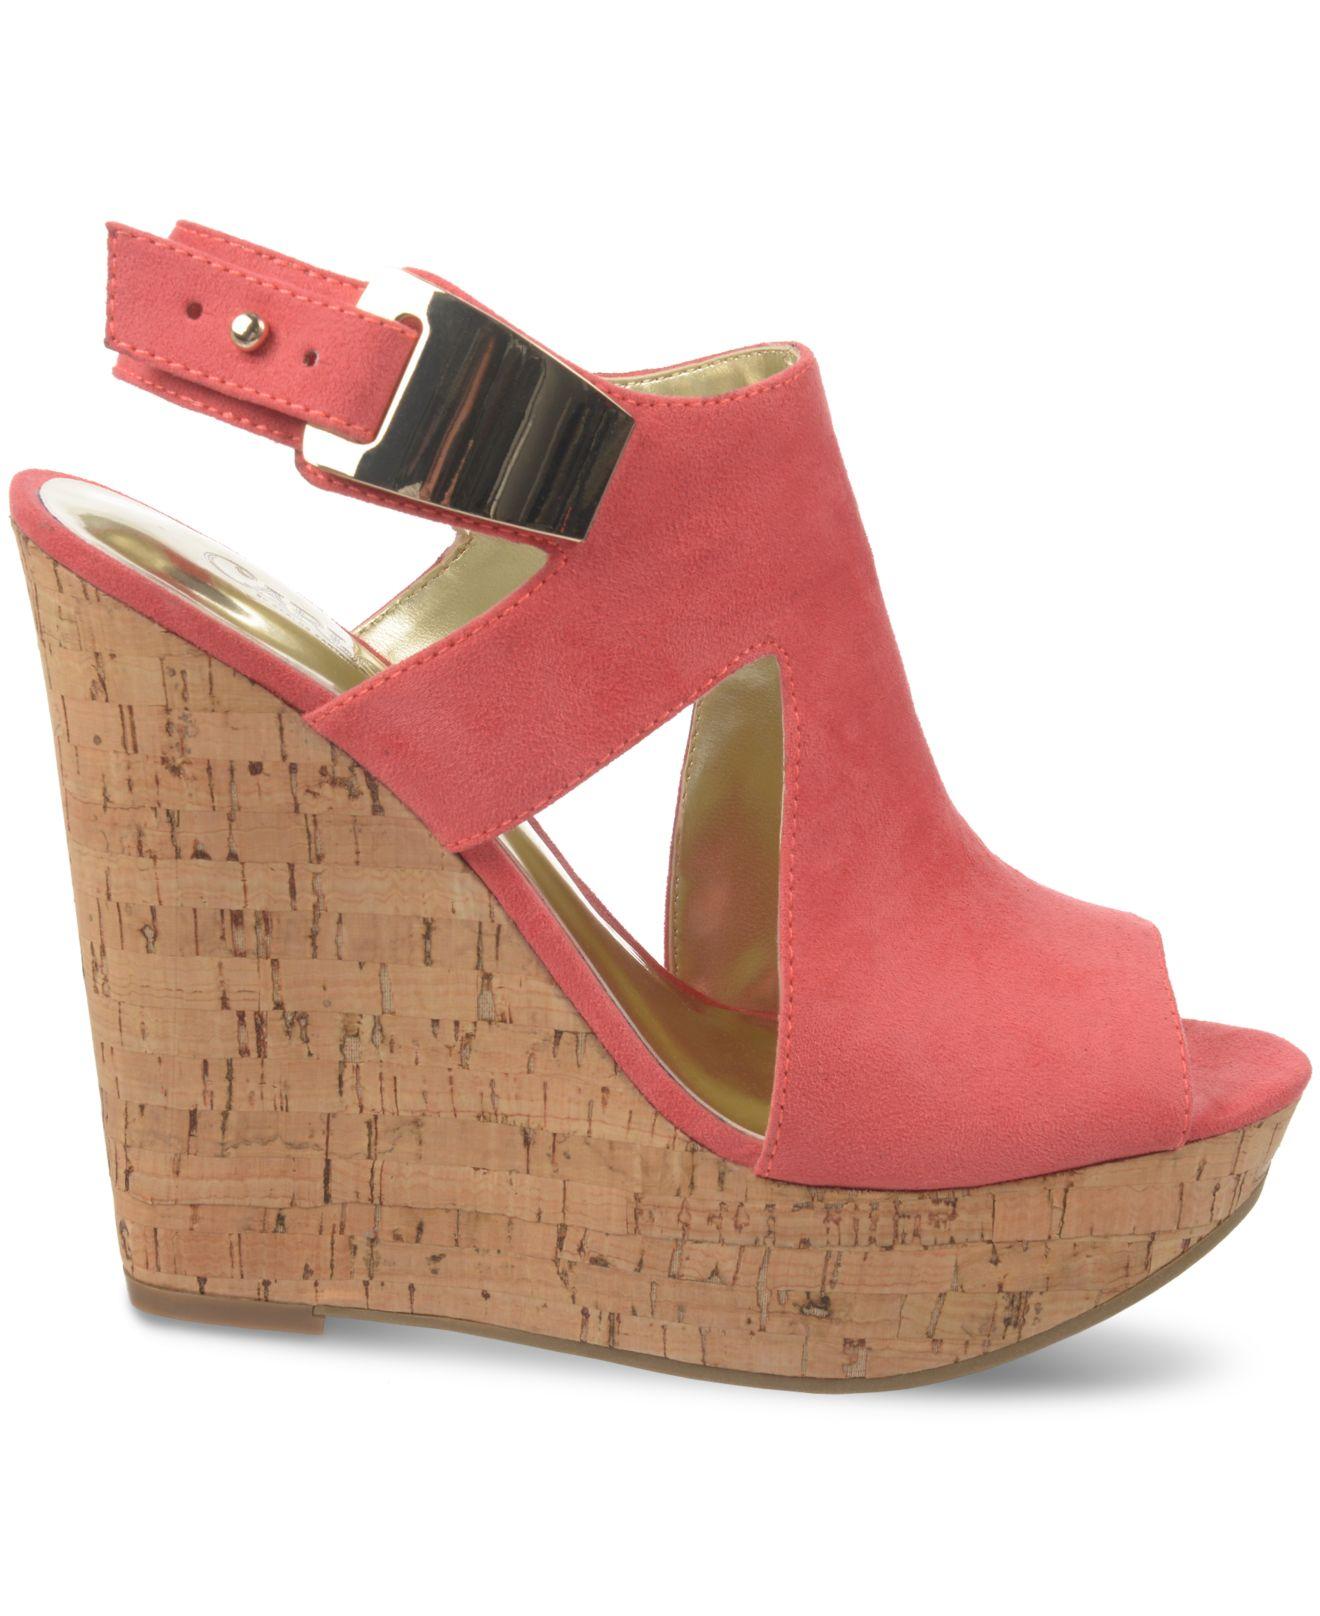 3b997e4d8b3a Lyst - Carlos By Carlos Santana Malor Platform Wedge Sandals in Red